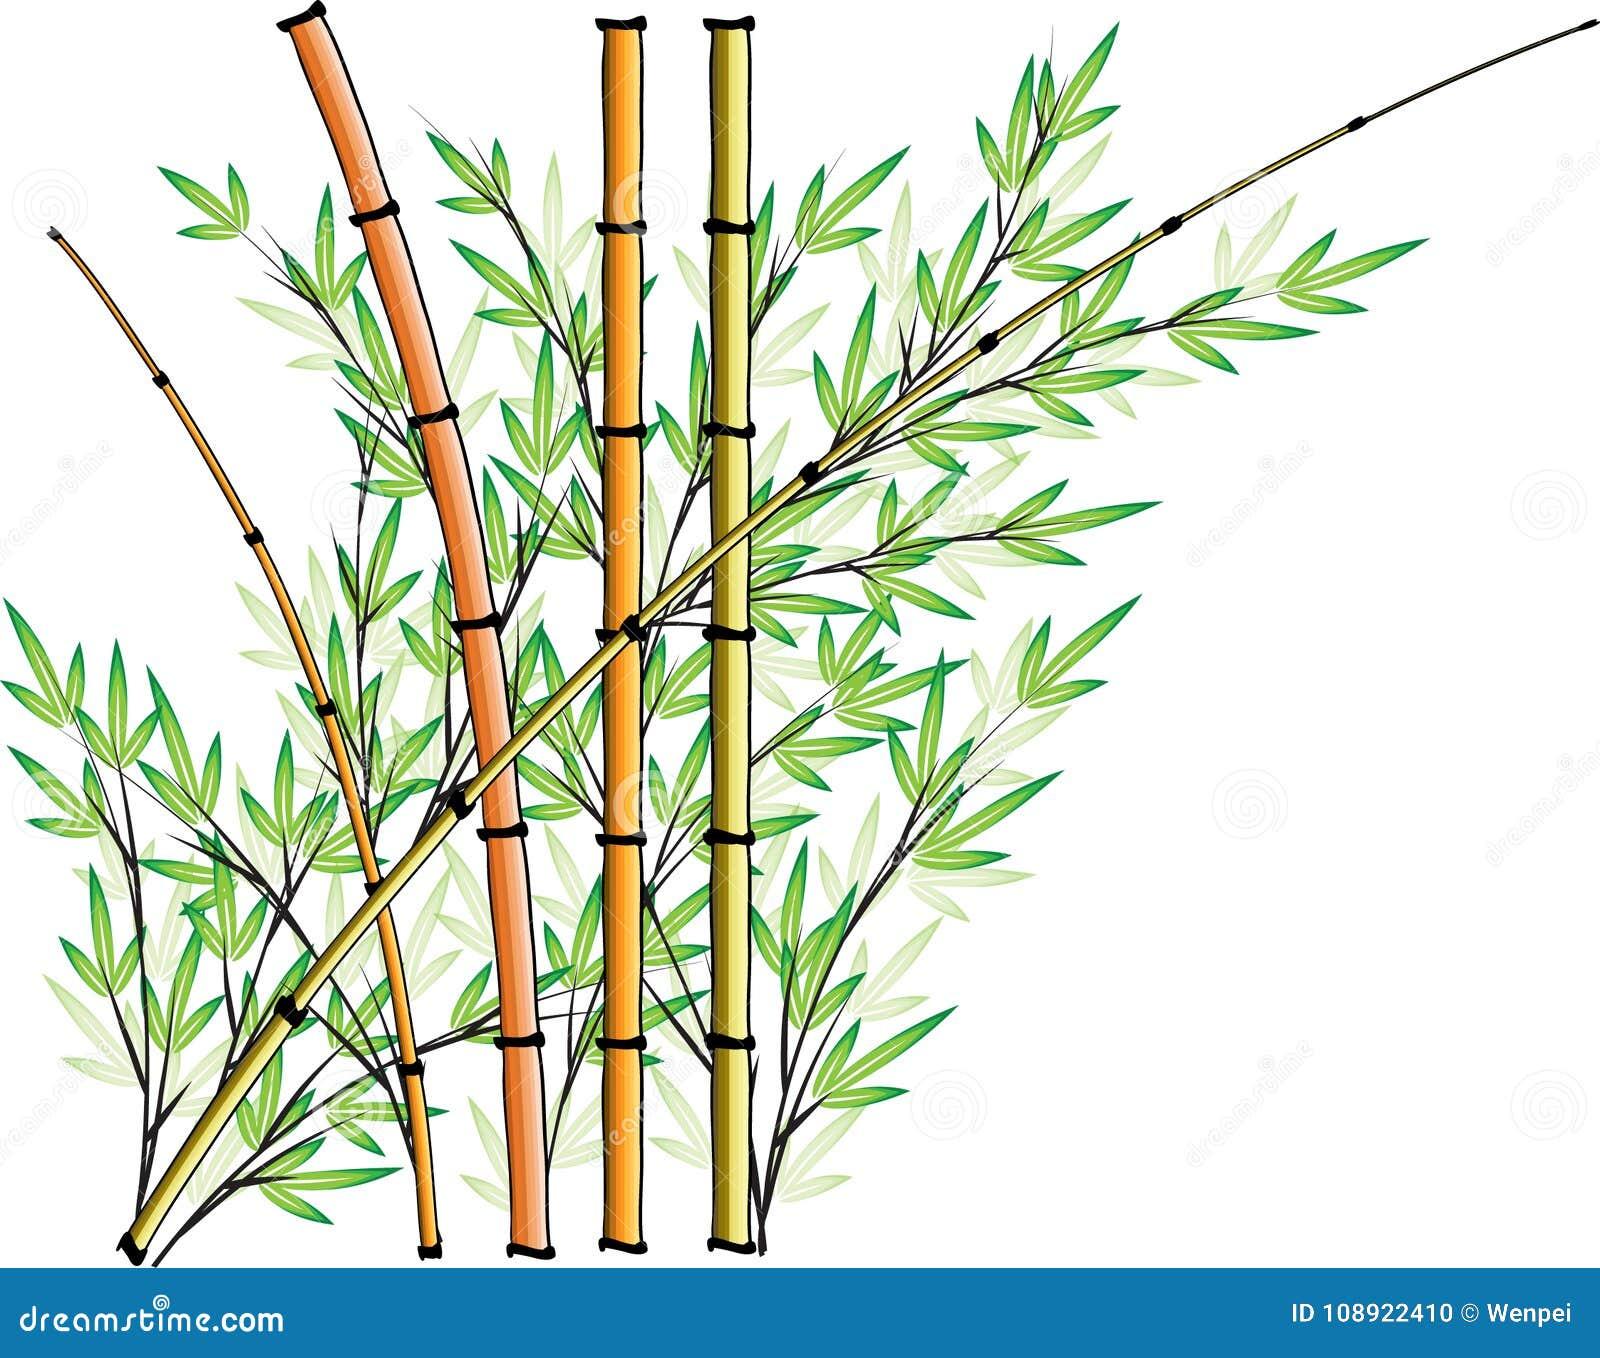 Vector Bamboo Tree Stock Illustrations 8 636 Vector Bamboo Tree Stock Illustrations Vectors Clipart Dreamstime